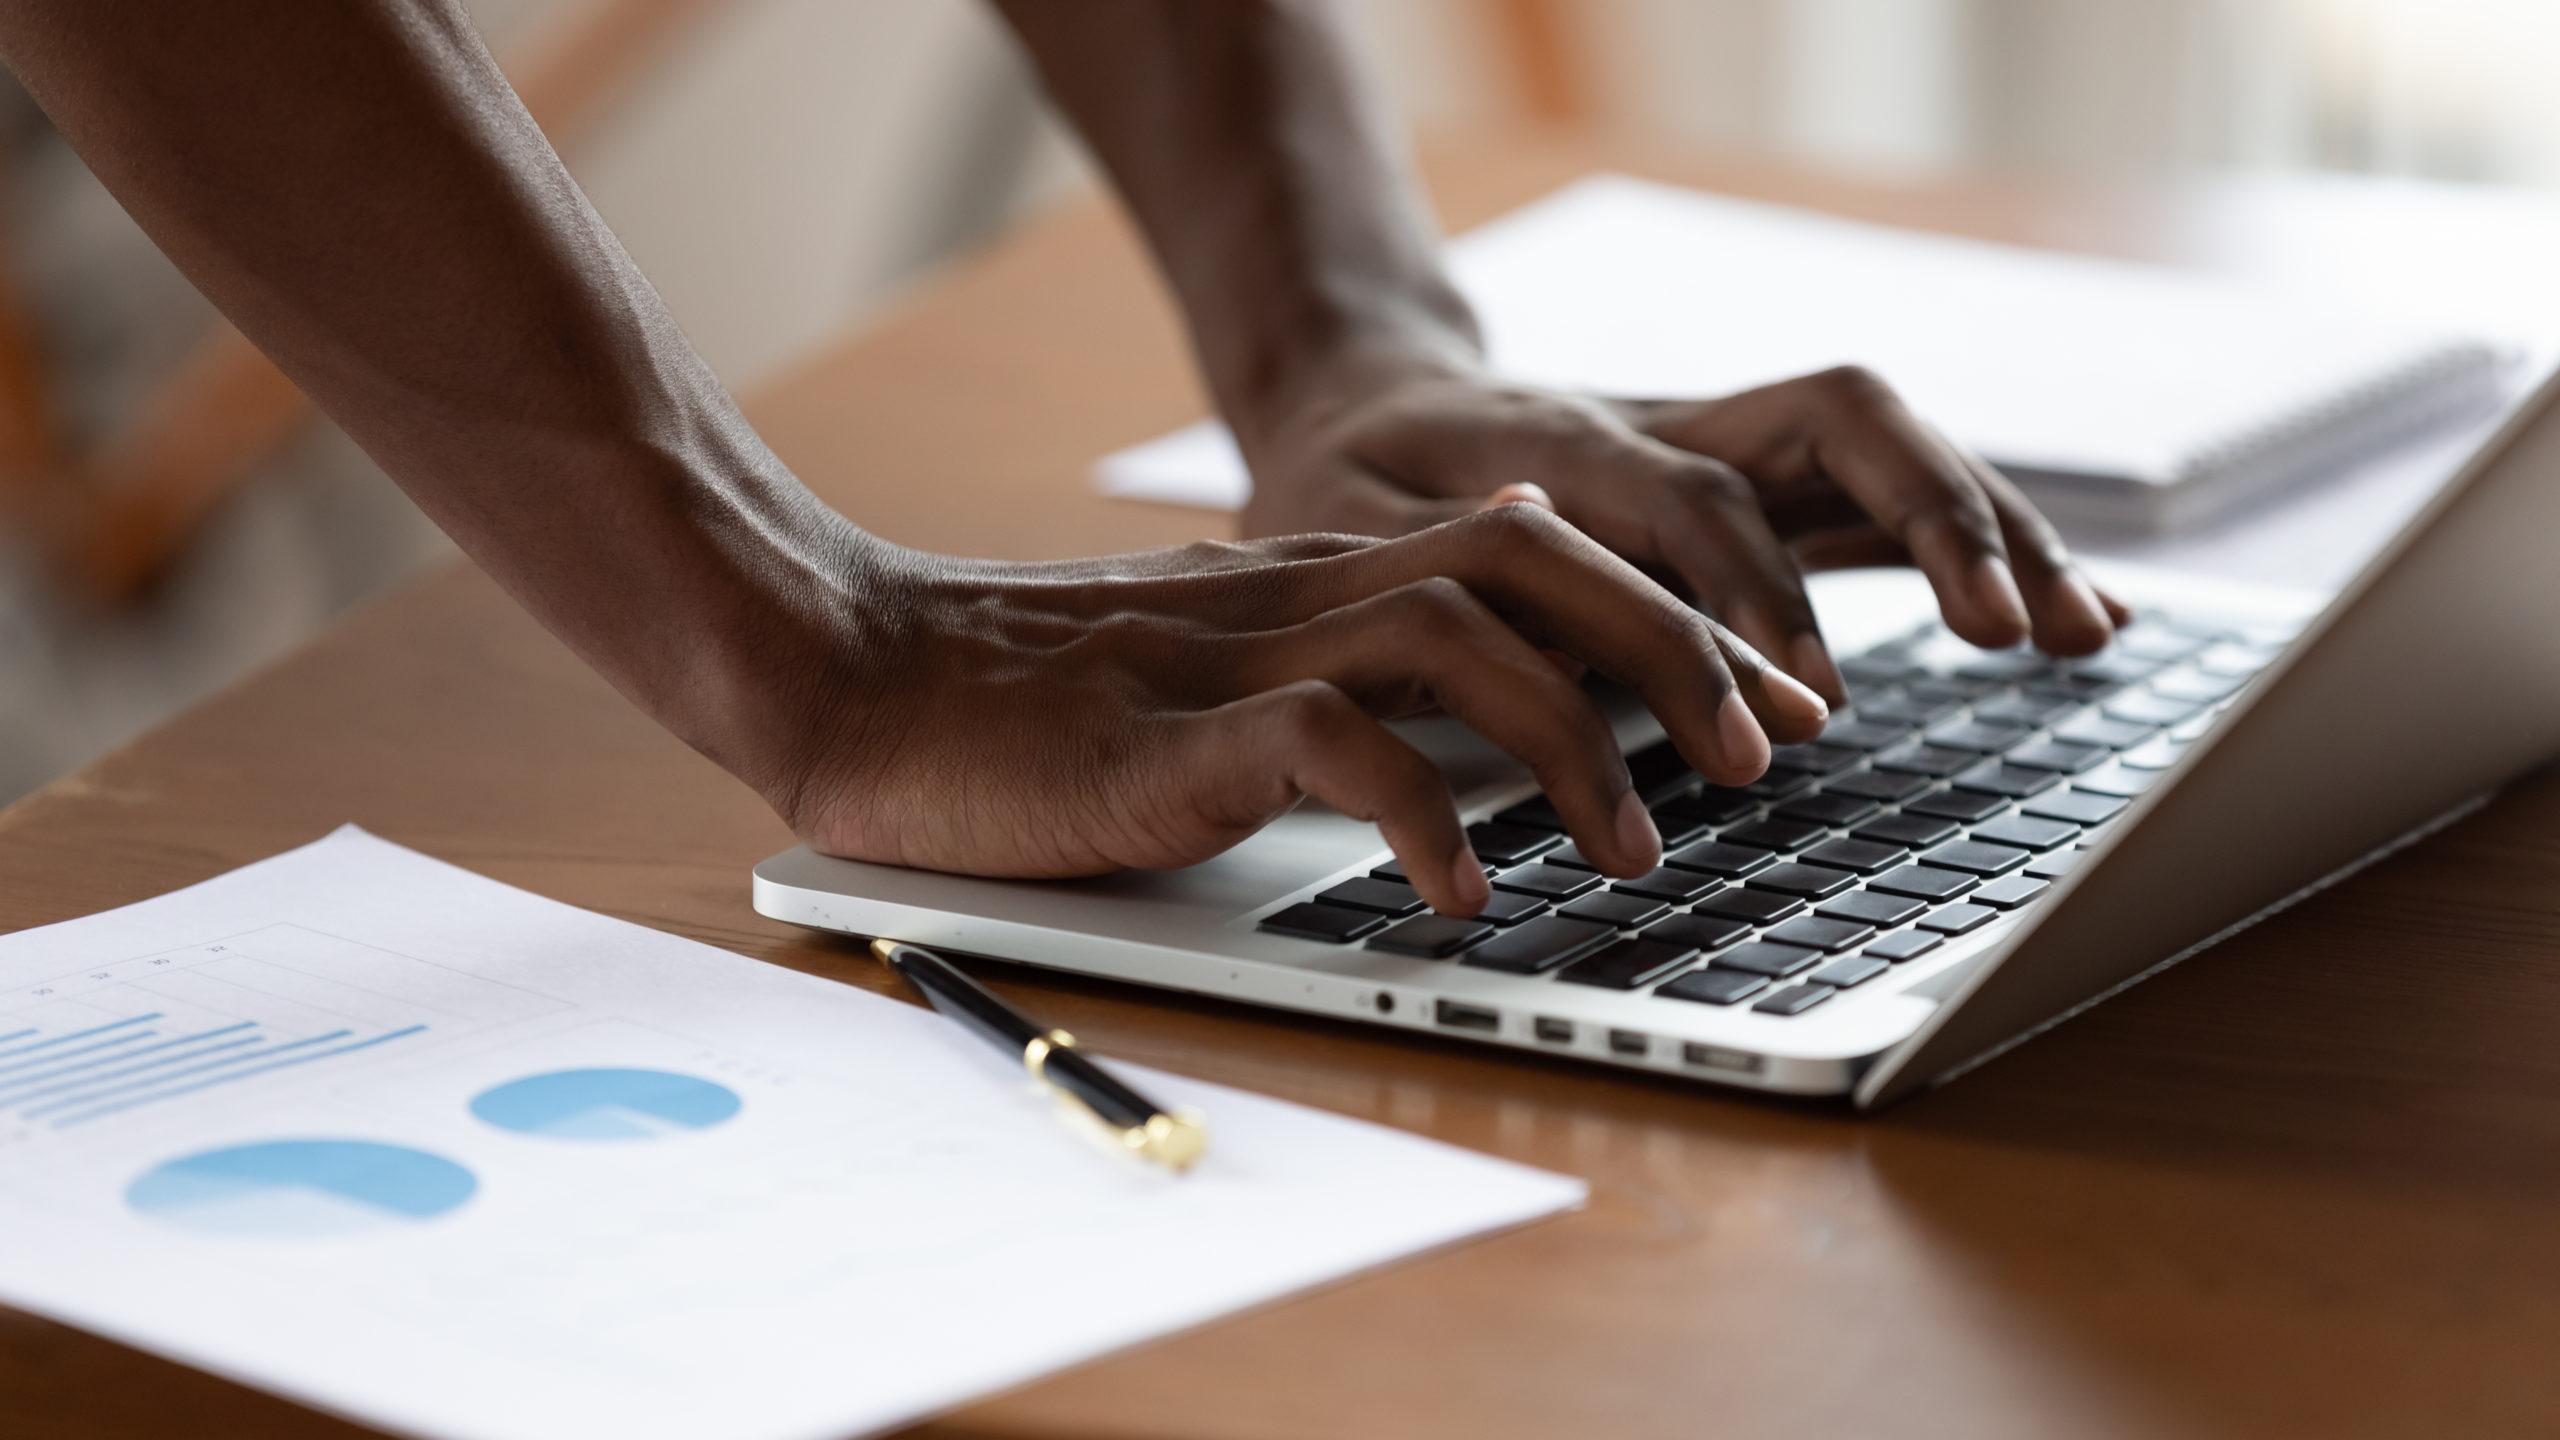 Nearly 18K companies meet substance reporting deadline so far